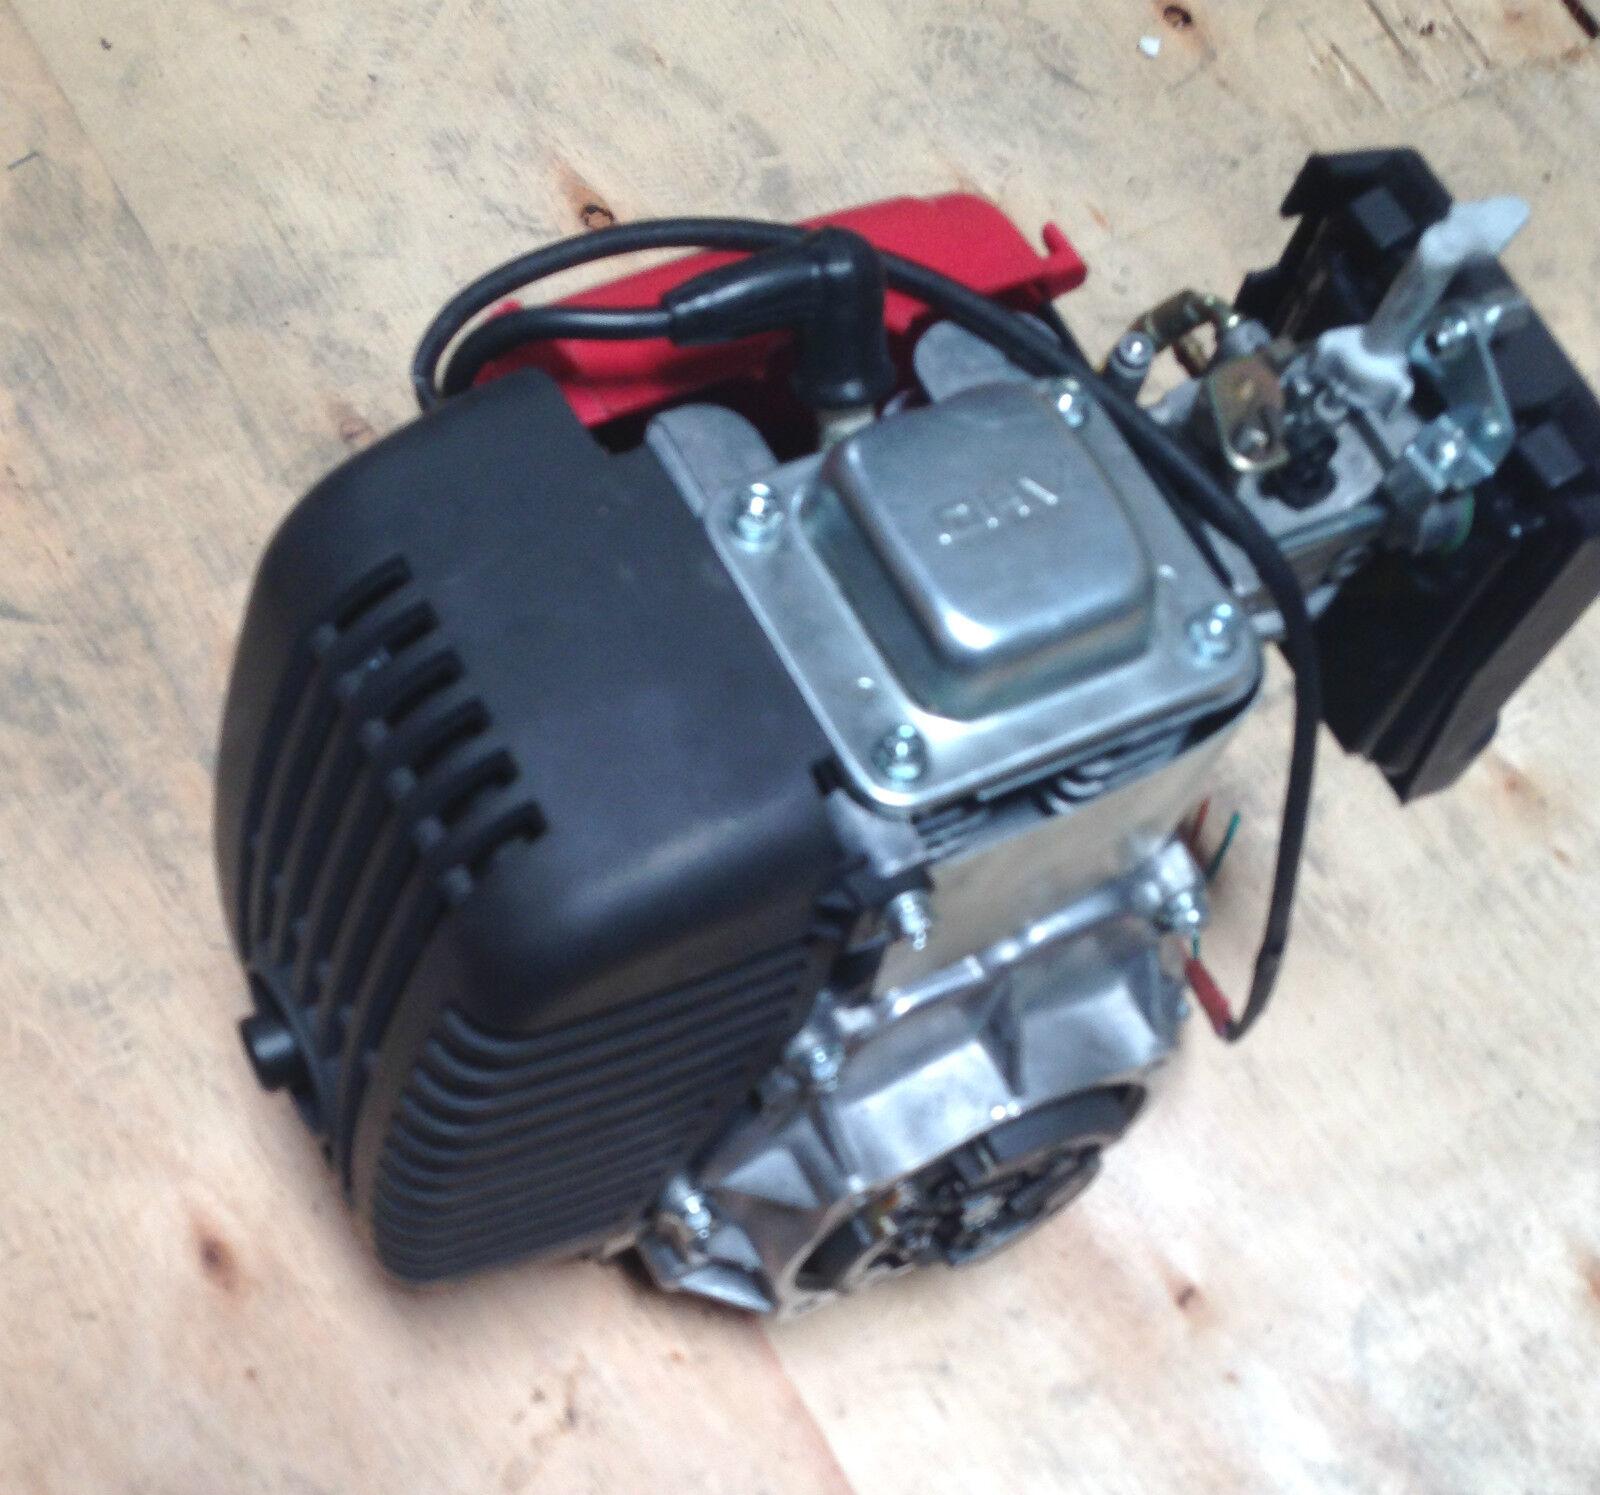 4 Stroke Engine Motor Bike Junk Parts Used 49cc Engine